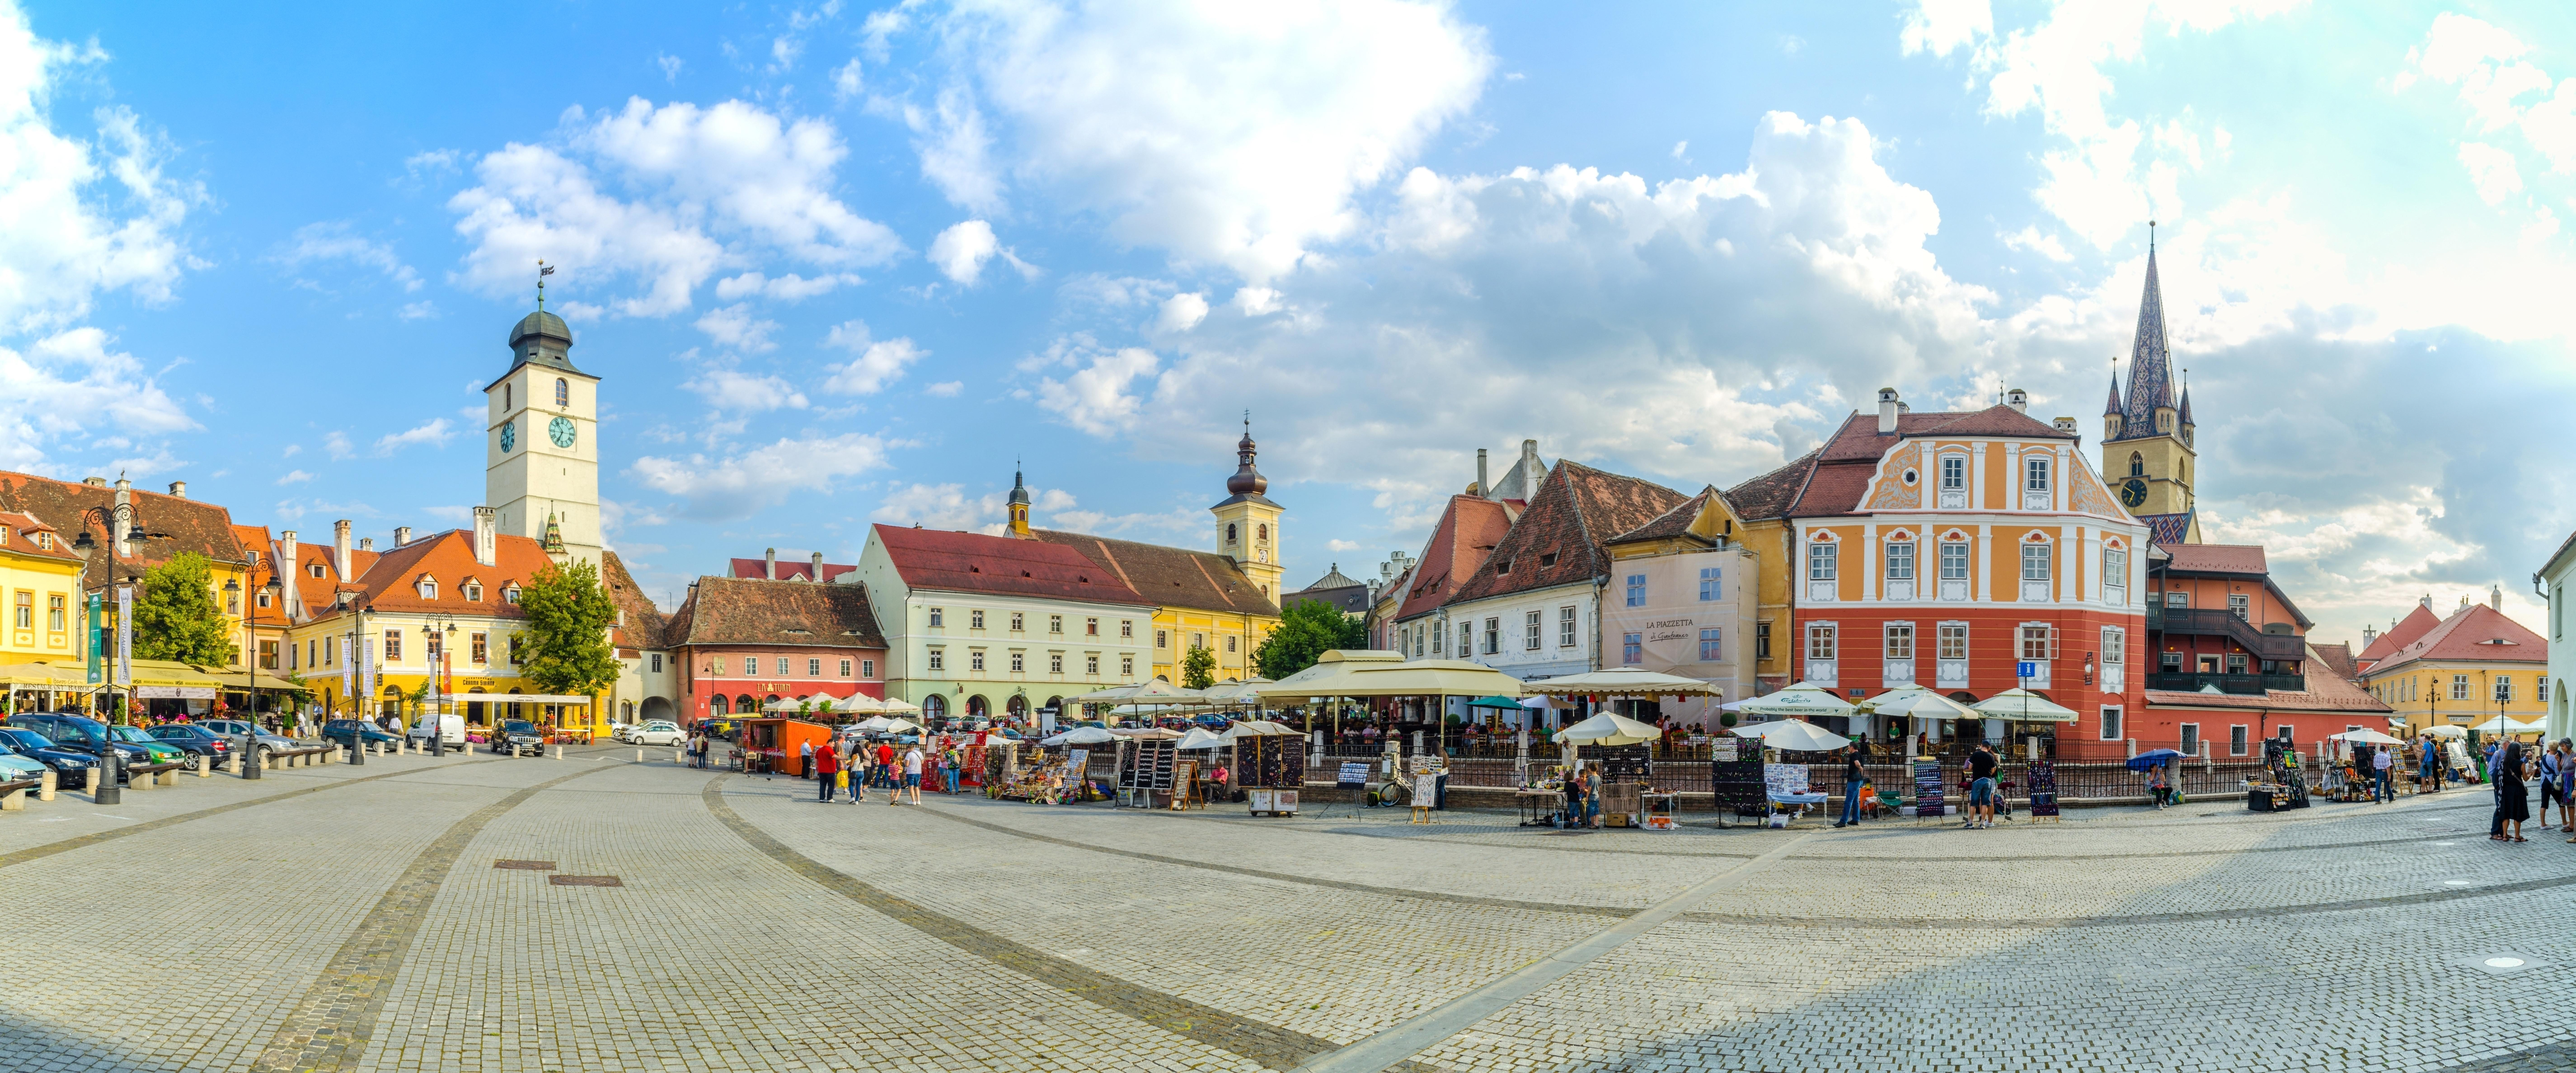 Rumänien Plz Sibiu